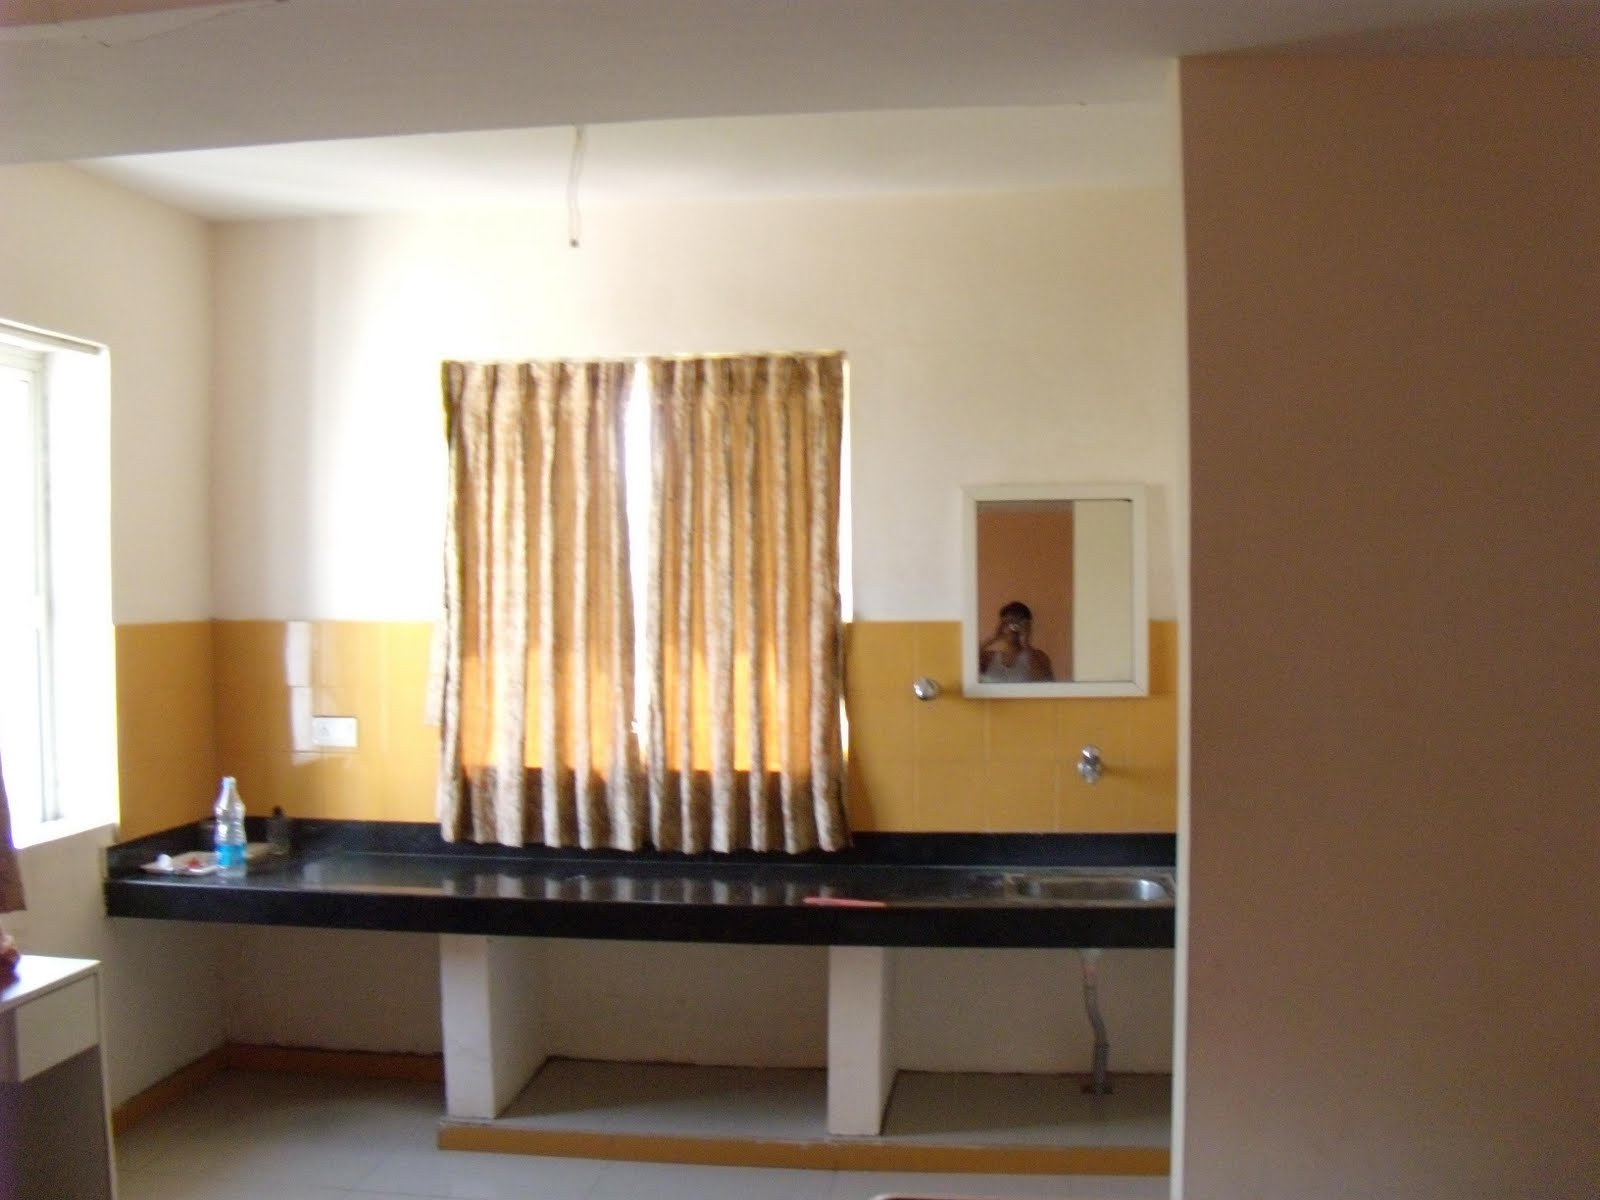 Studio Apartment Gandhinagar Infocity the great indian it industry: rememering tcs ilp gandhinagar days